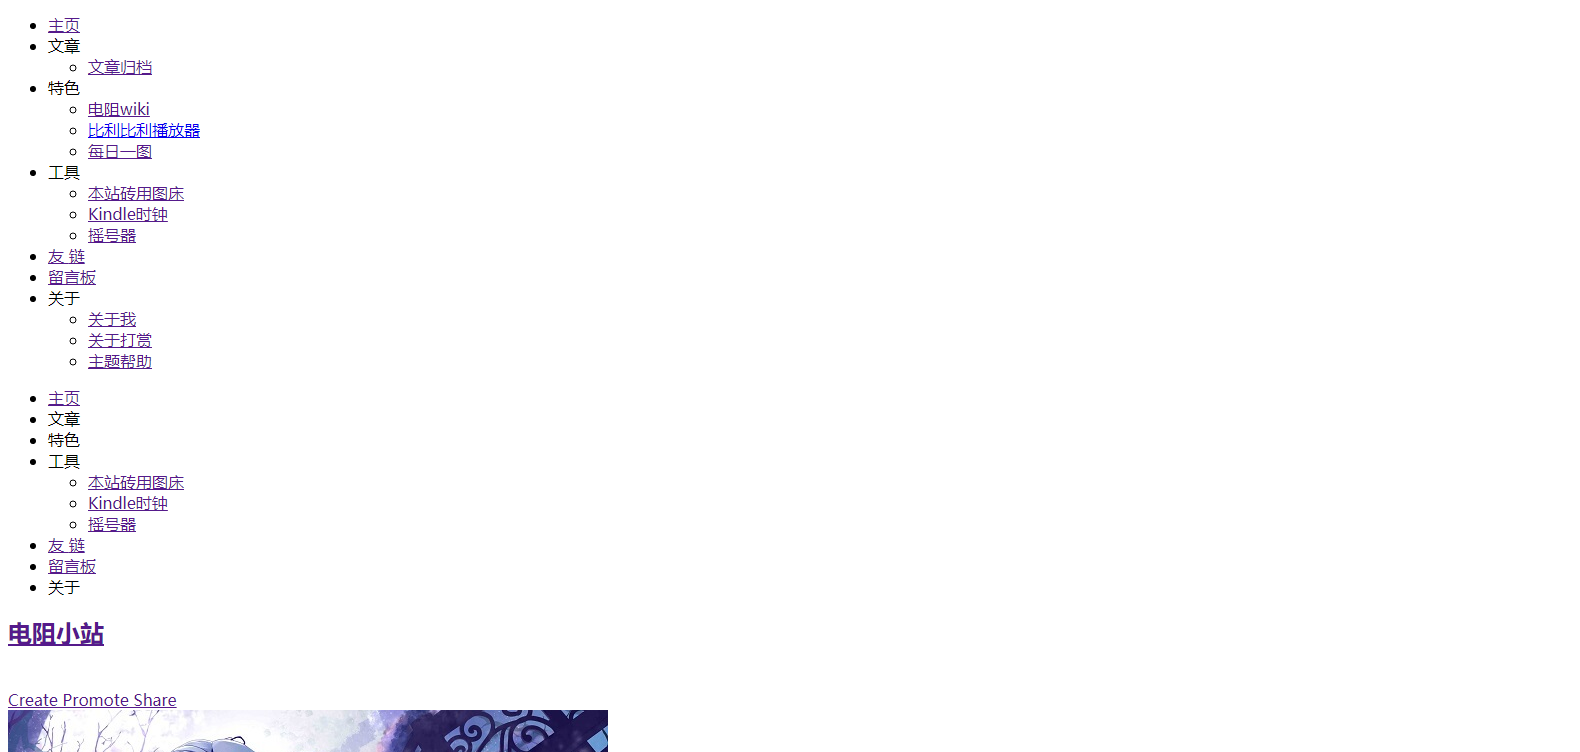 8fbed5b72f64f20ab4153d6d592394cc - 继·换域名有感